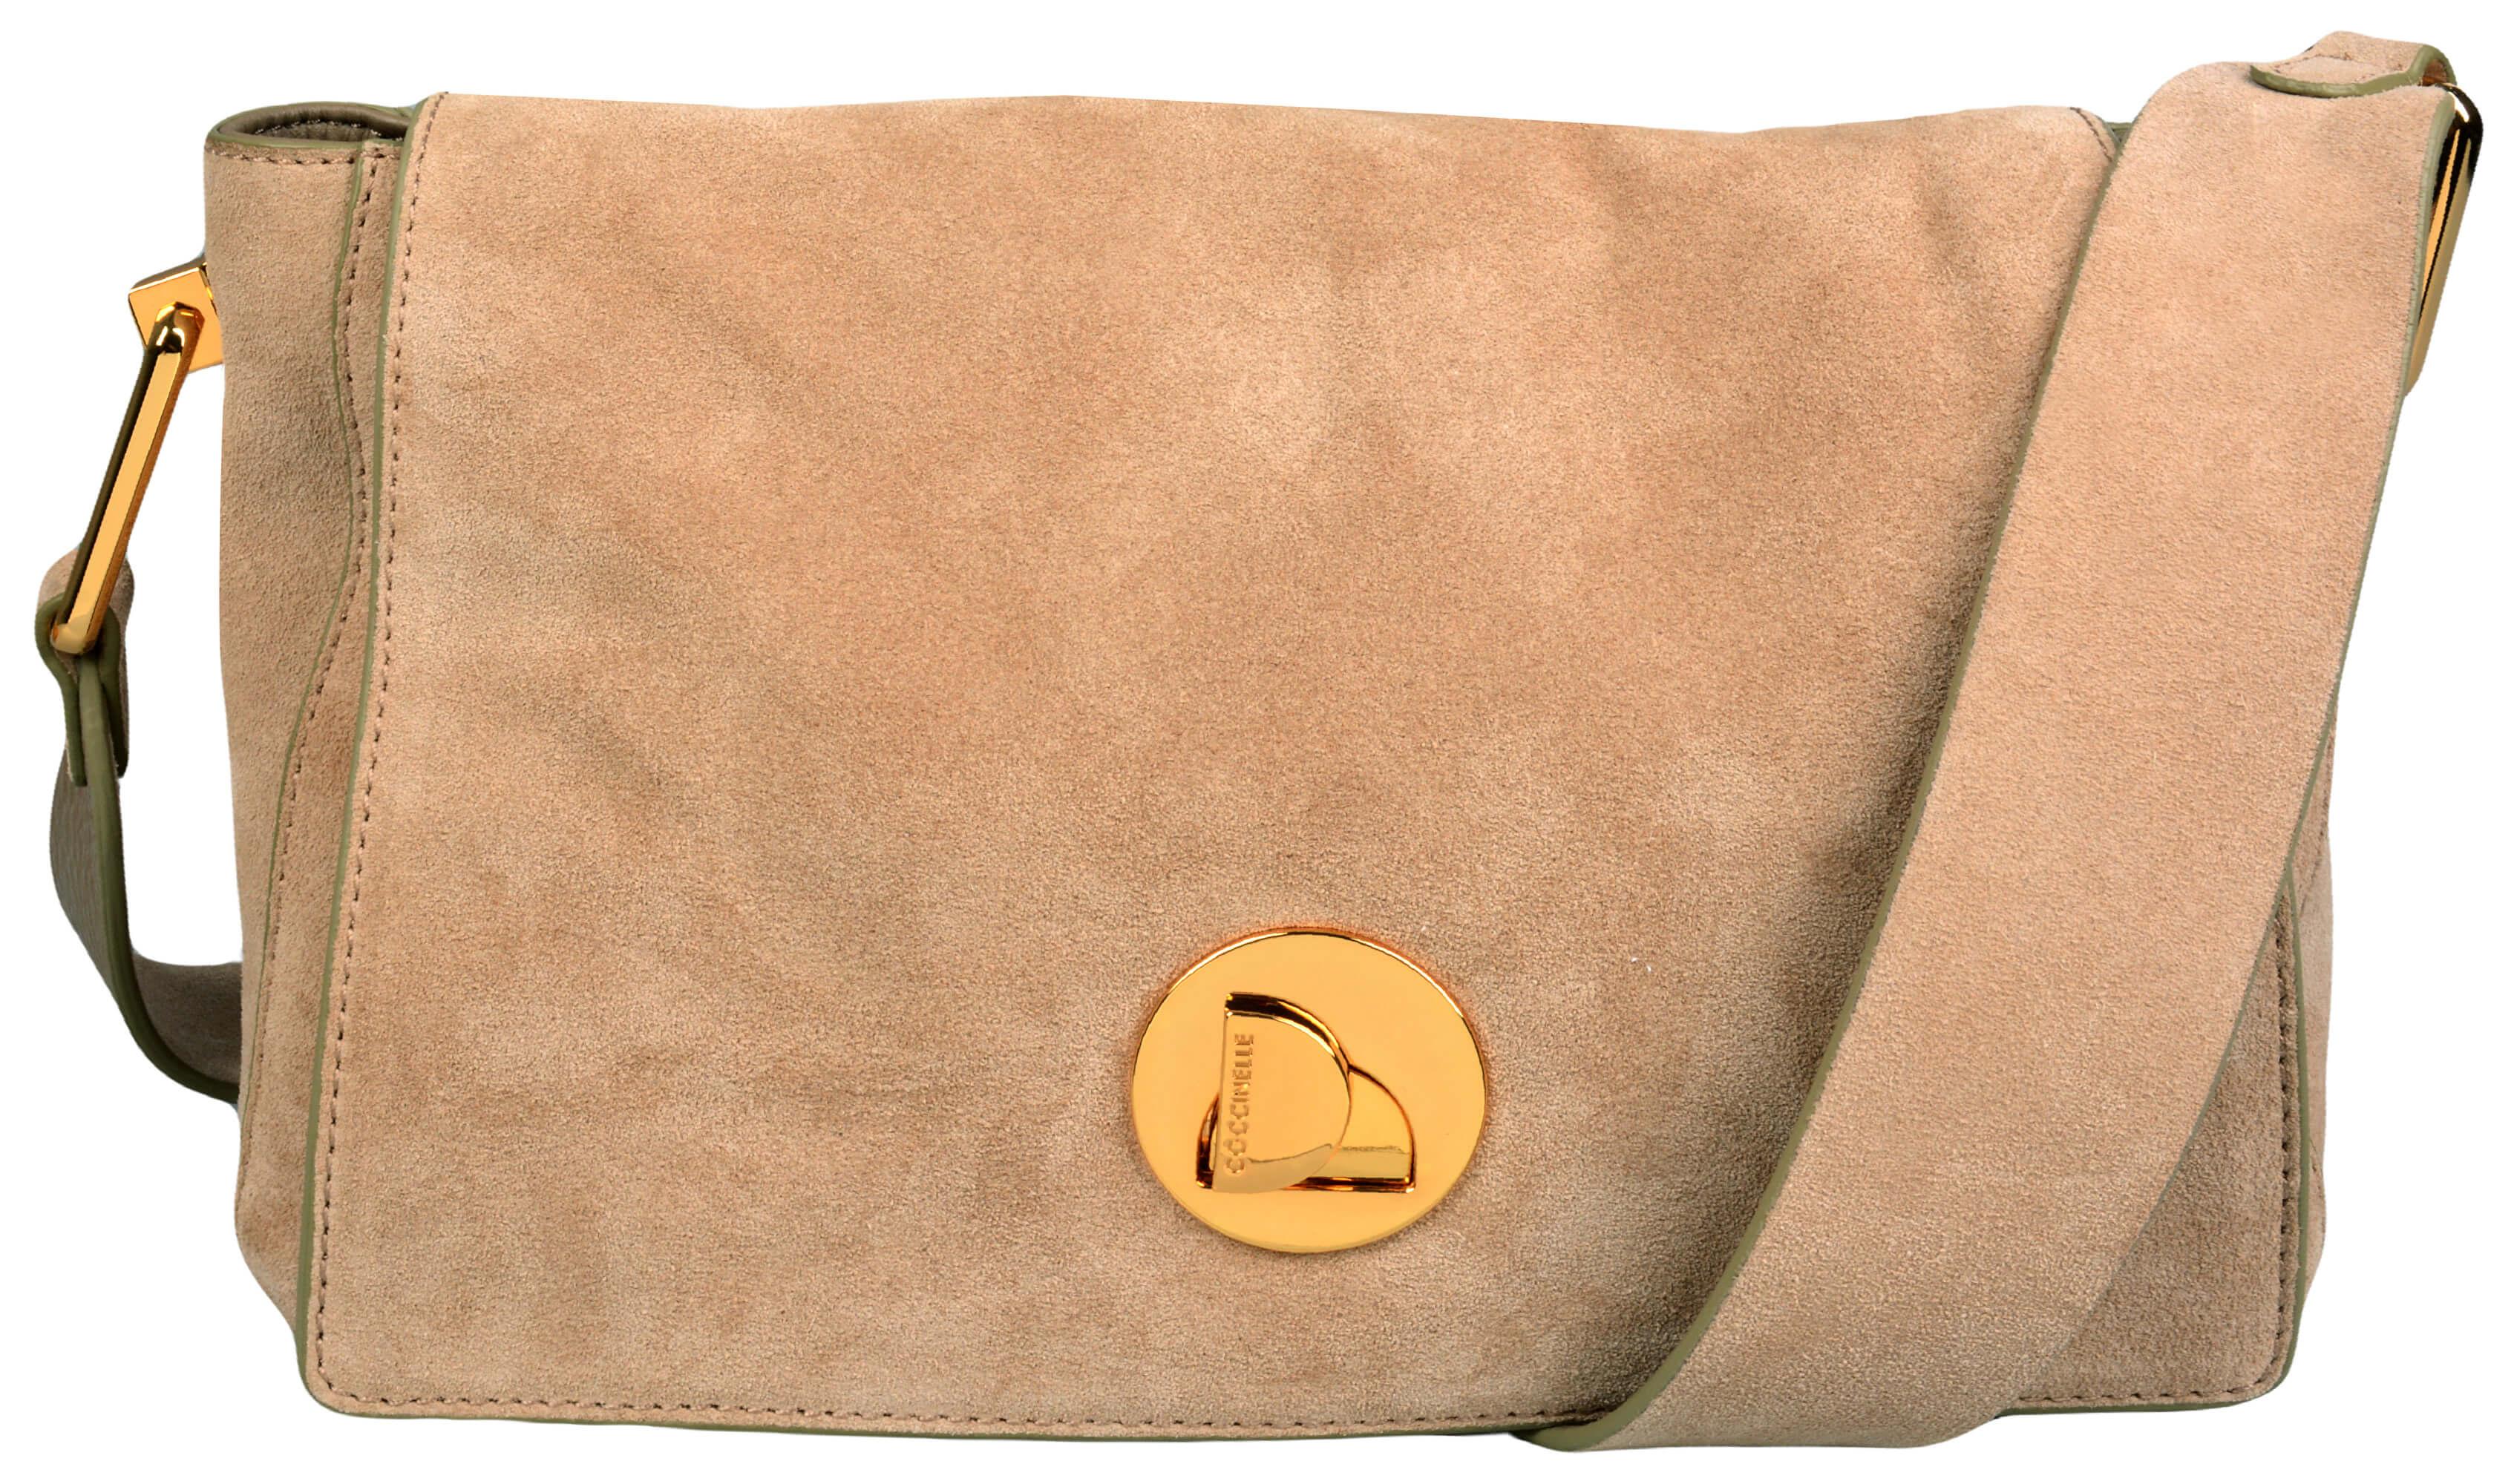 55747a4497 Coccinelle Luxusná kožená kabelka YA2 12 01 01 179 TU ZĽAVA Doprava ...